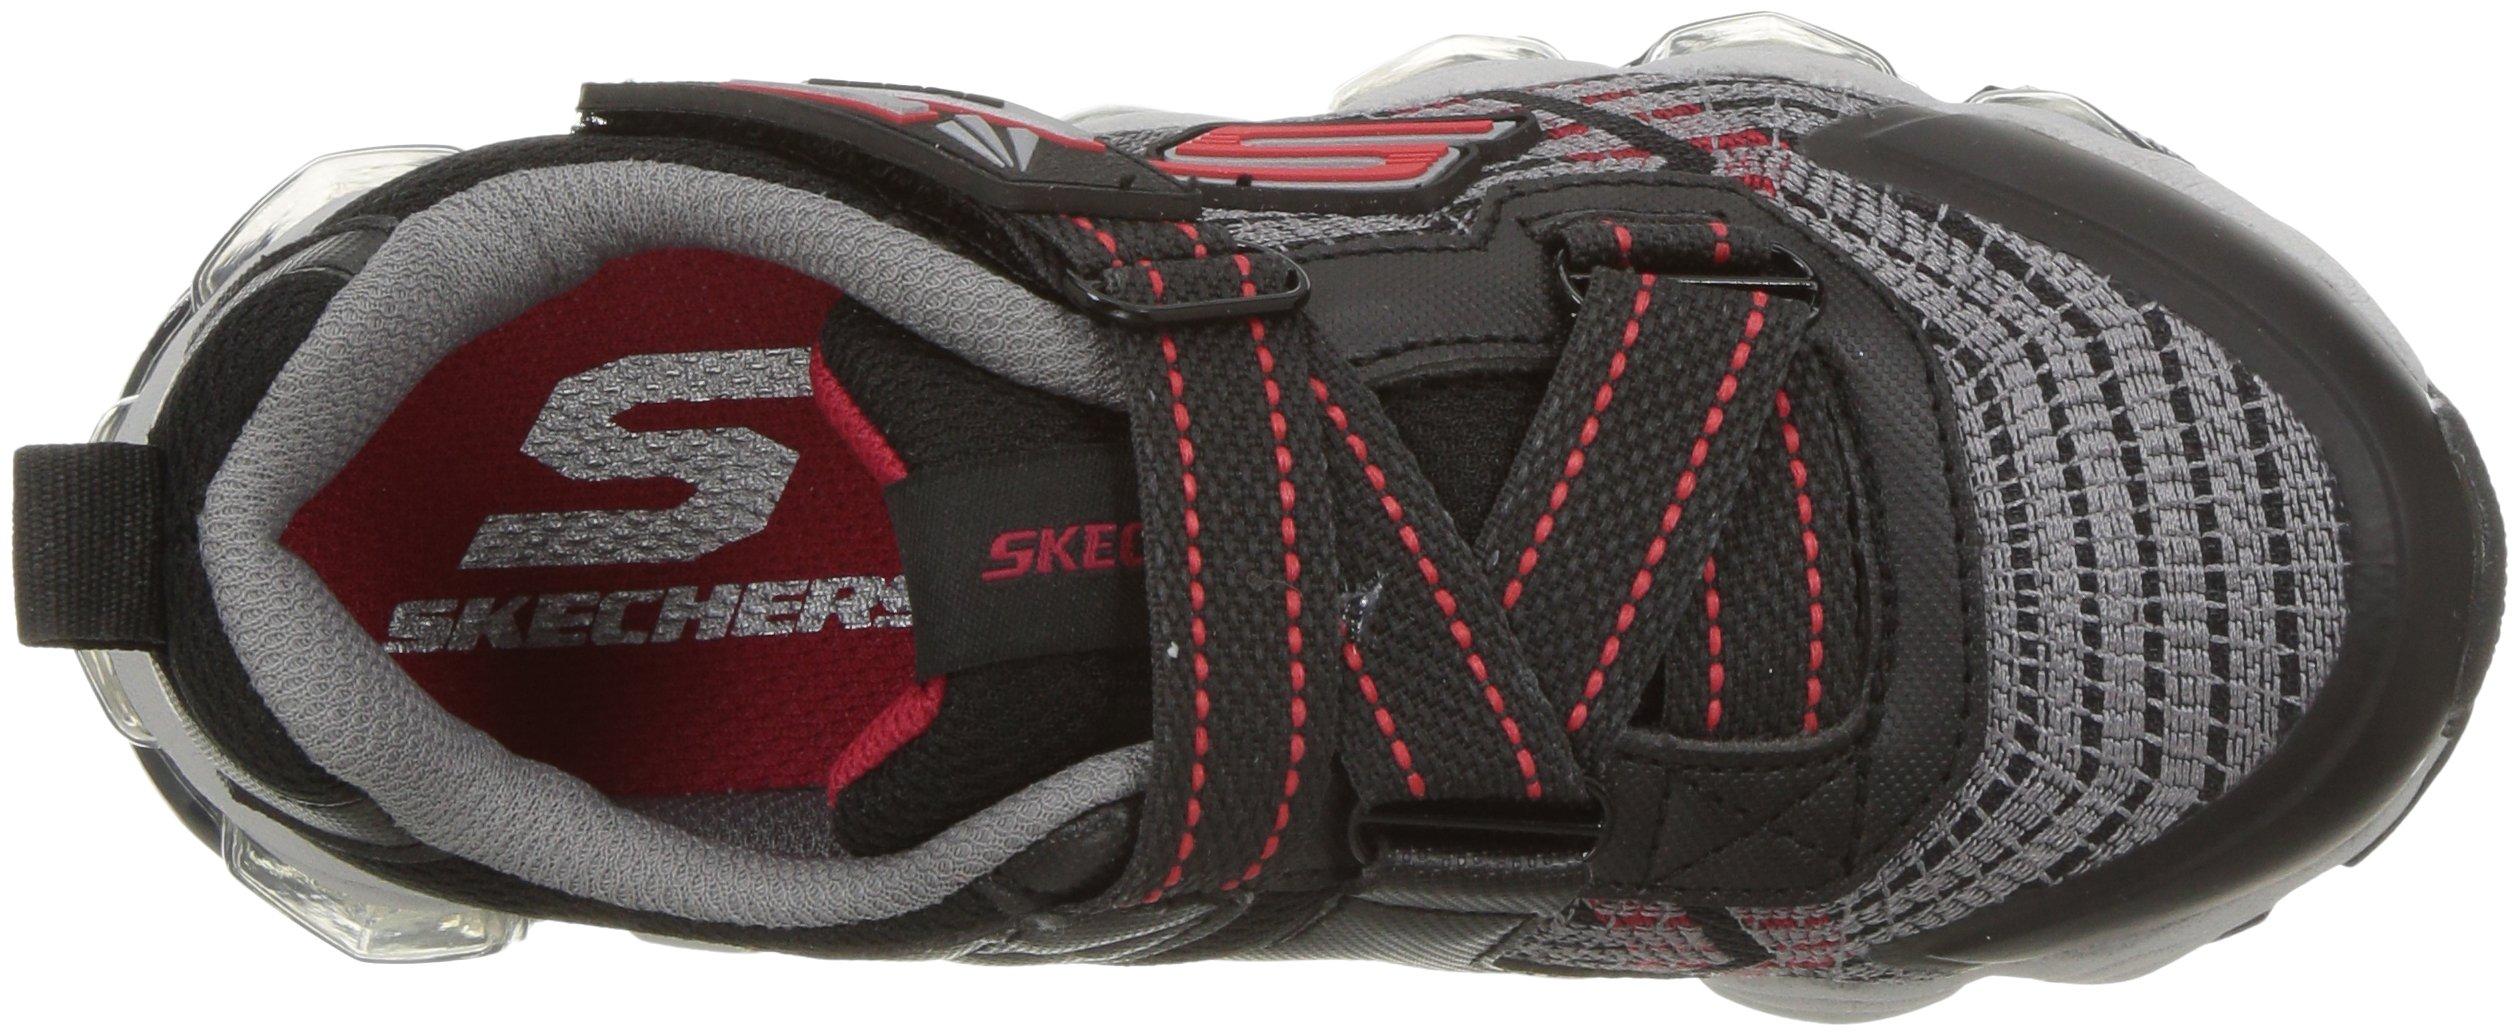 Skechers Kids Boys' Turbo-Flash-90596L Sneaker,Black/red,3 Medium US Little Kid by Skechers (Image #7)